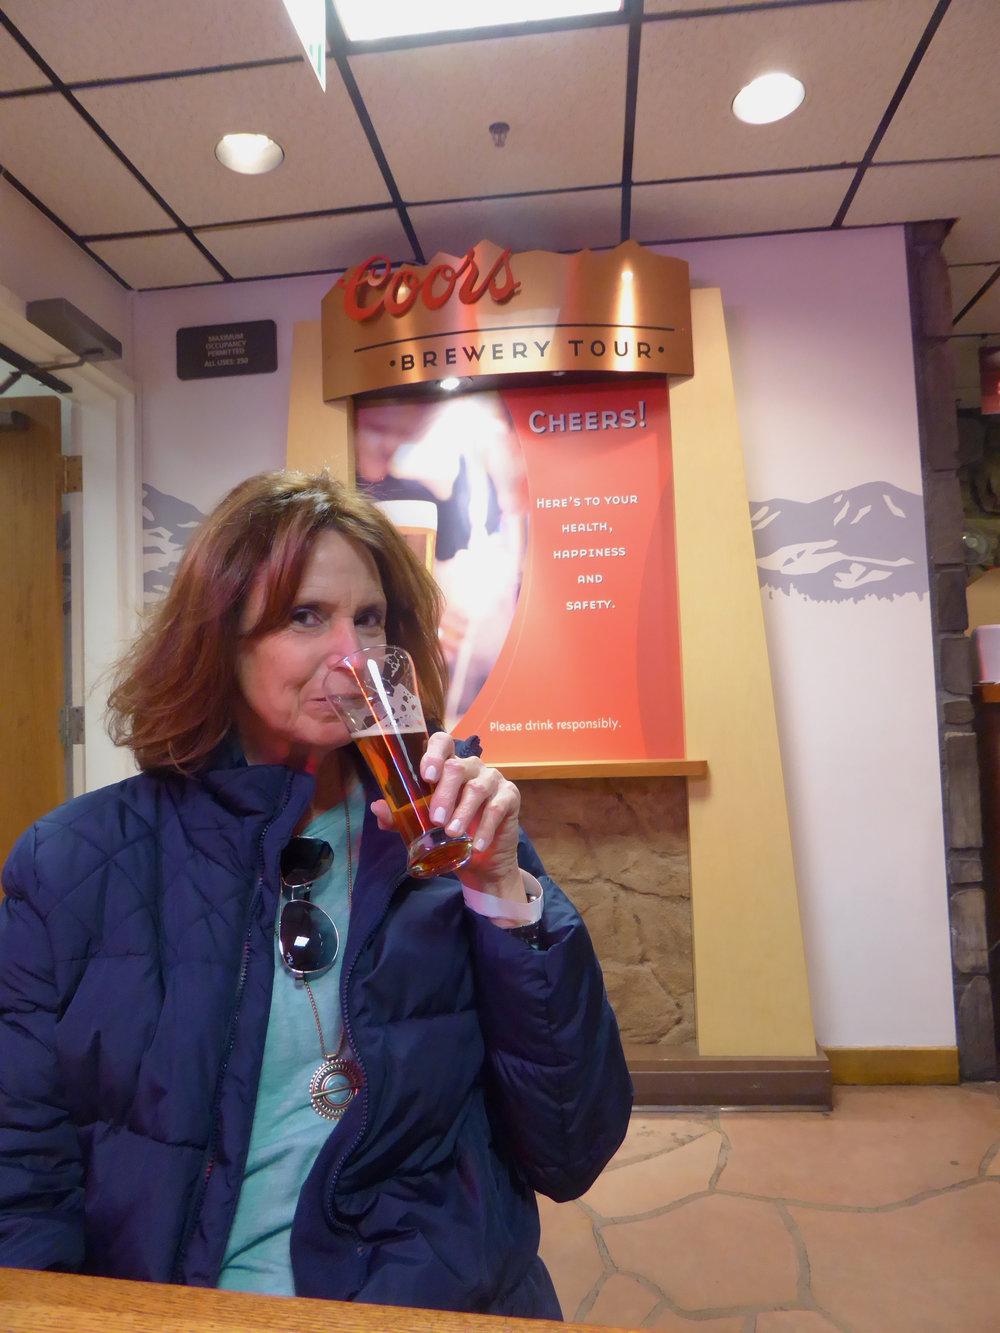 cindi_Coors_brewery_tour_spiritedtable_photo05.jpg